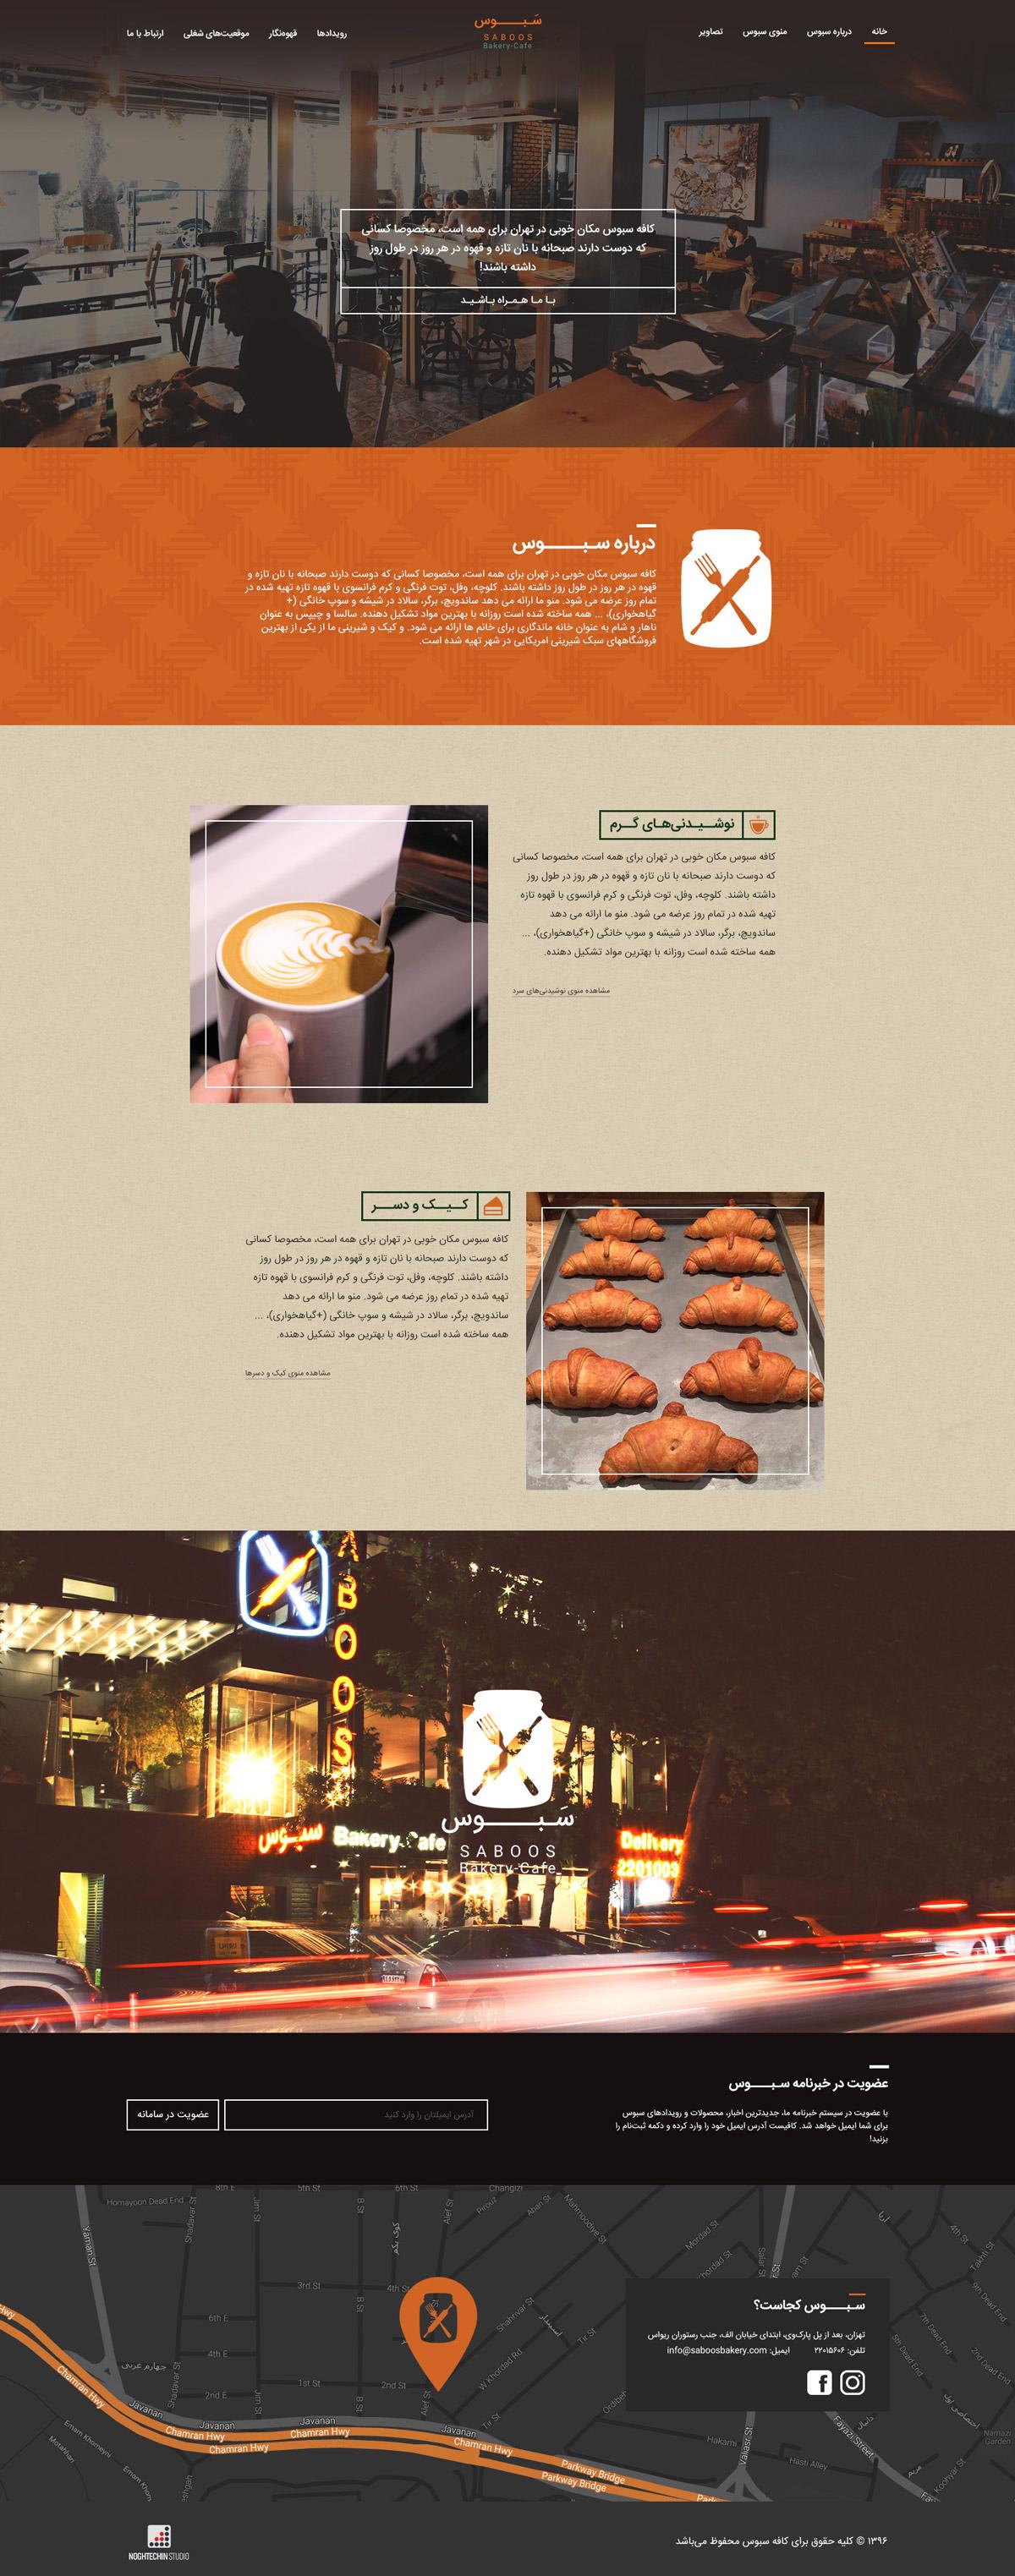 Saboos Bakery-Cafe